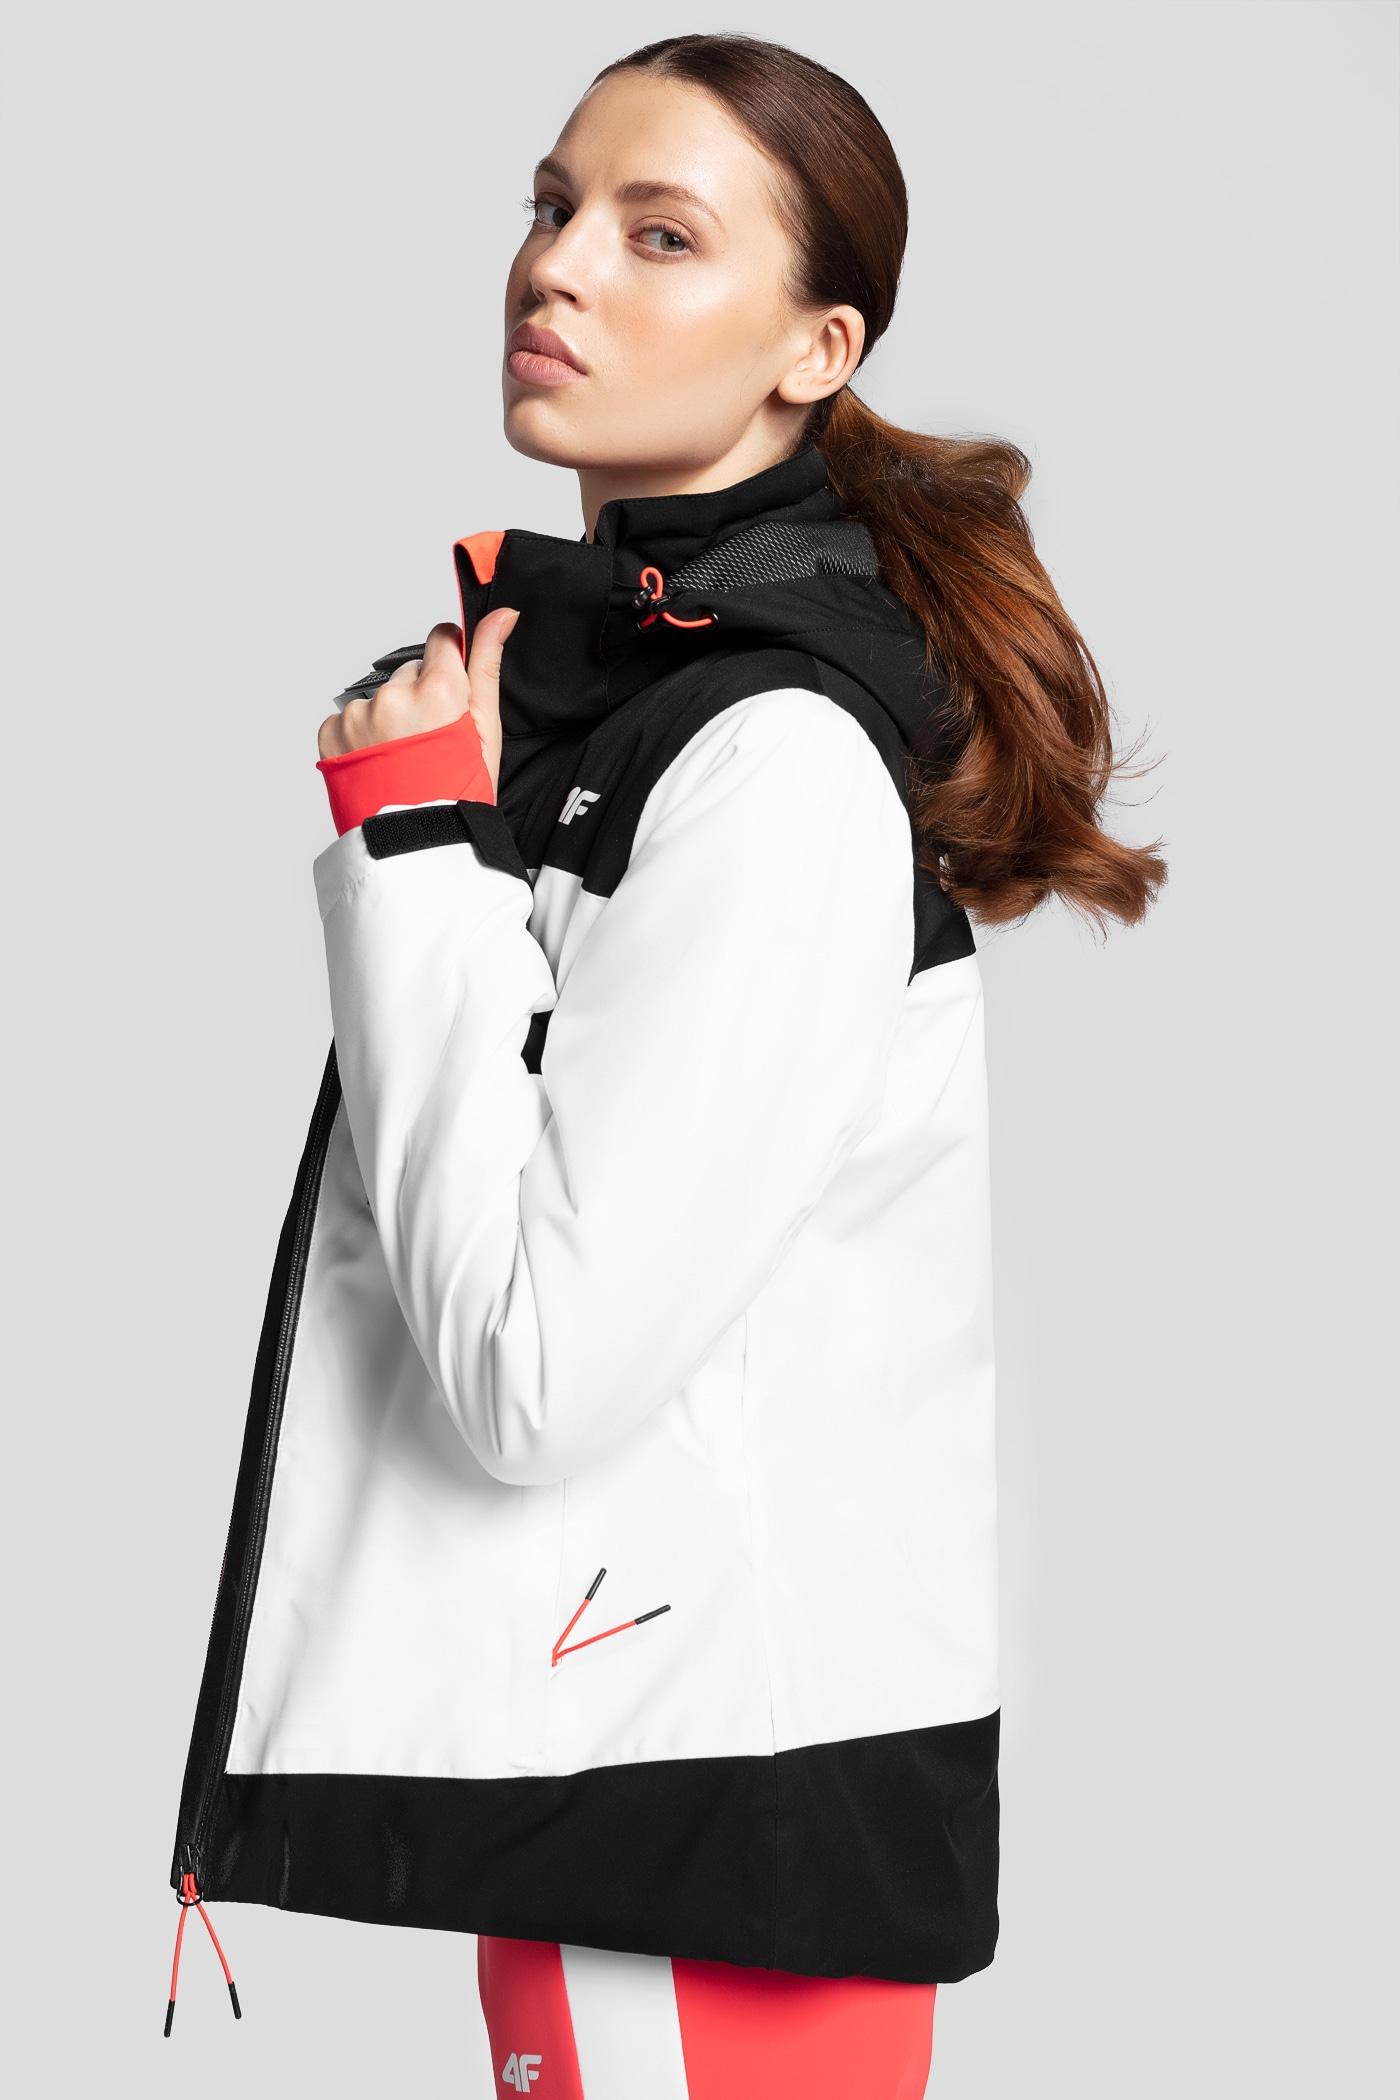 4f kurtka narciarska damska kudn251